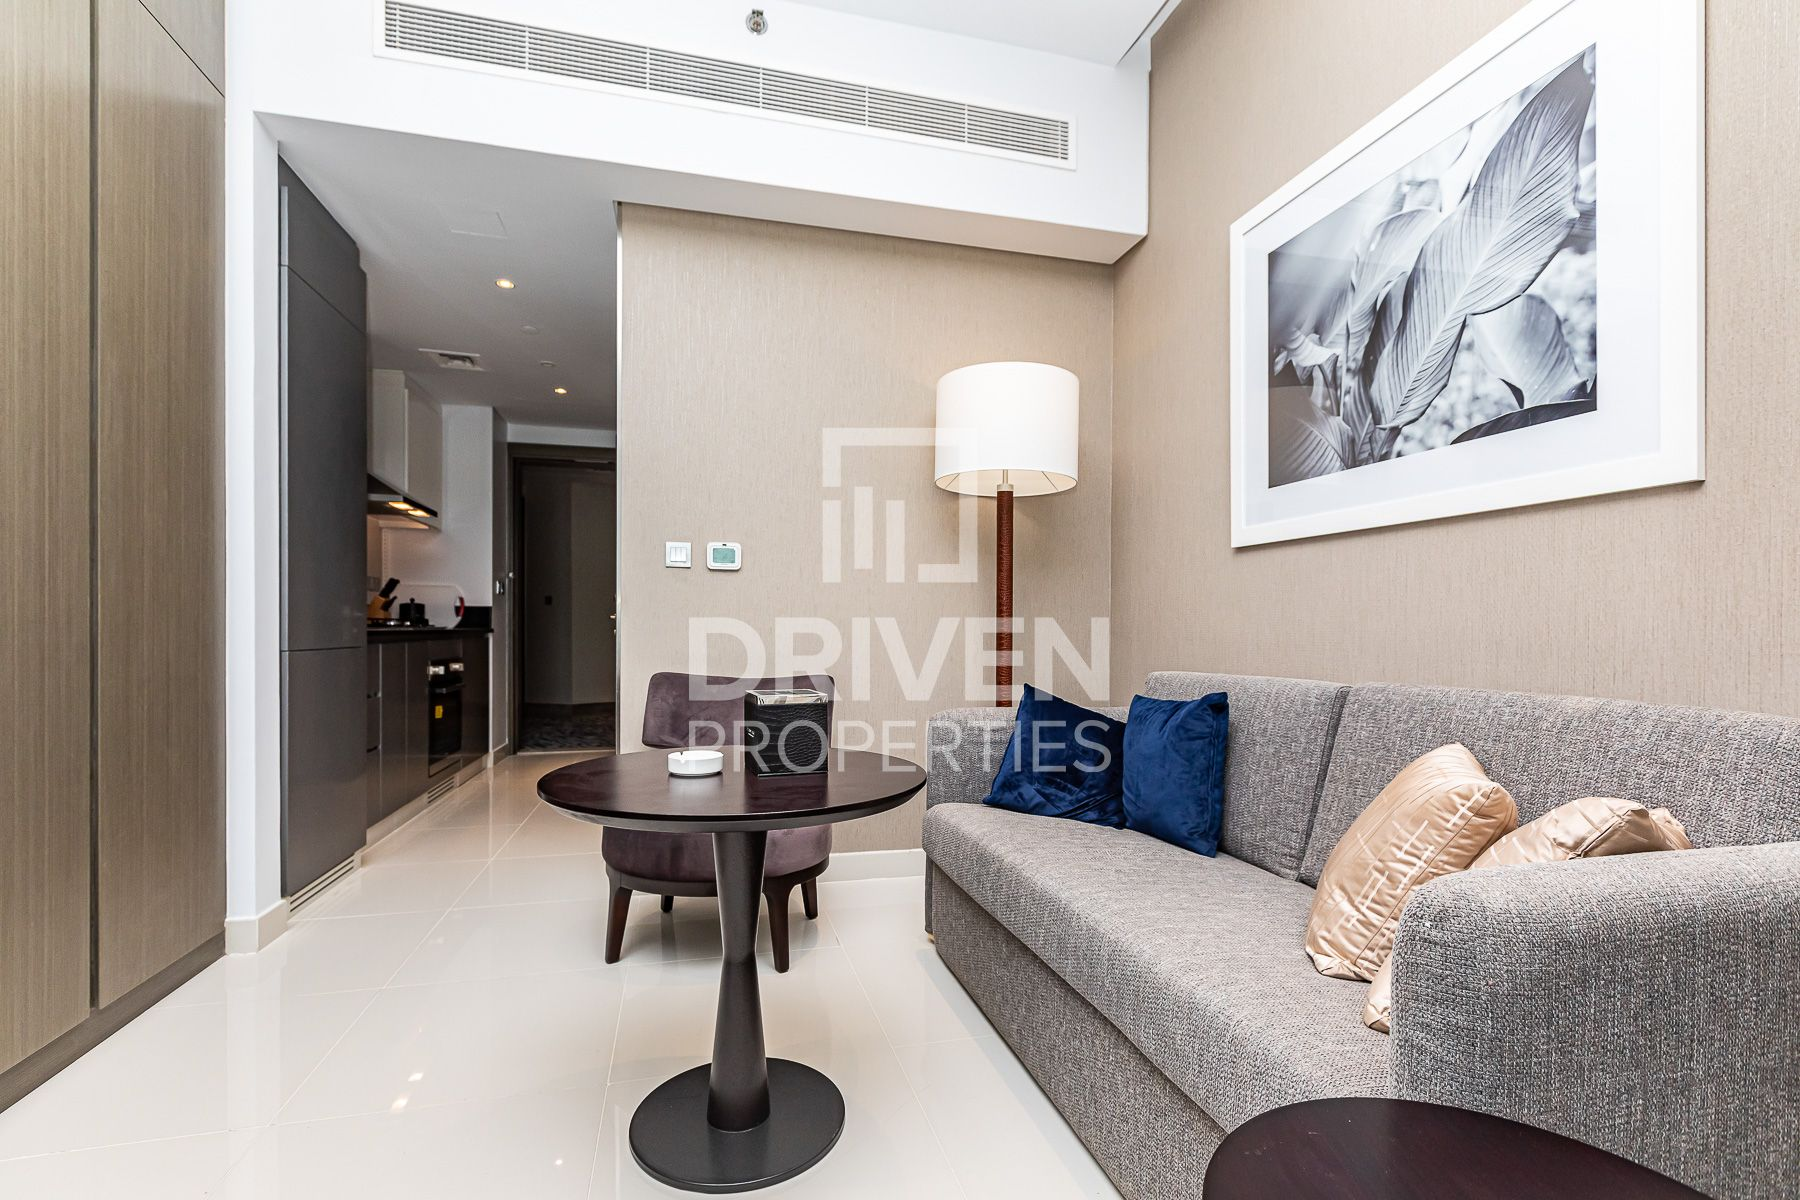 Studio for Rent in DAMAC Maison Privé - Business Bay